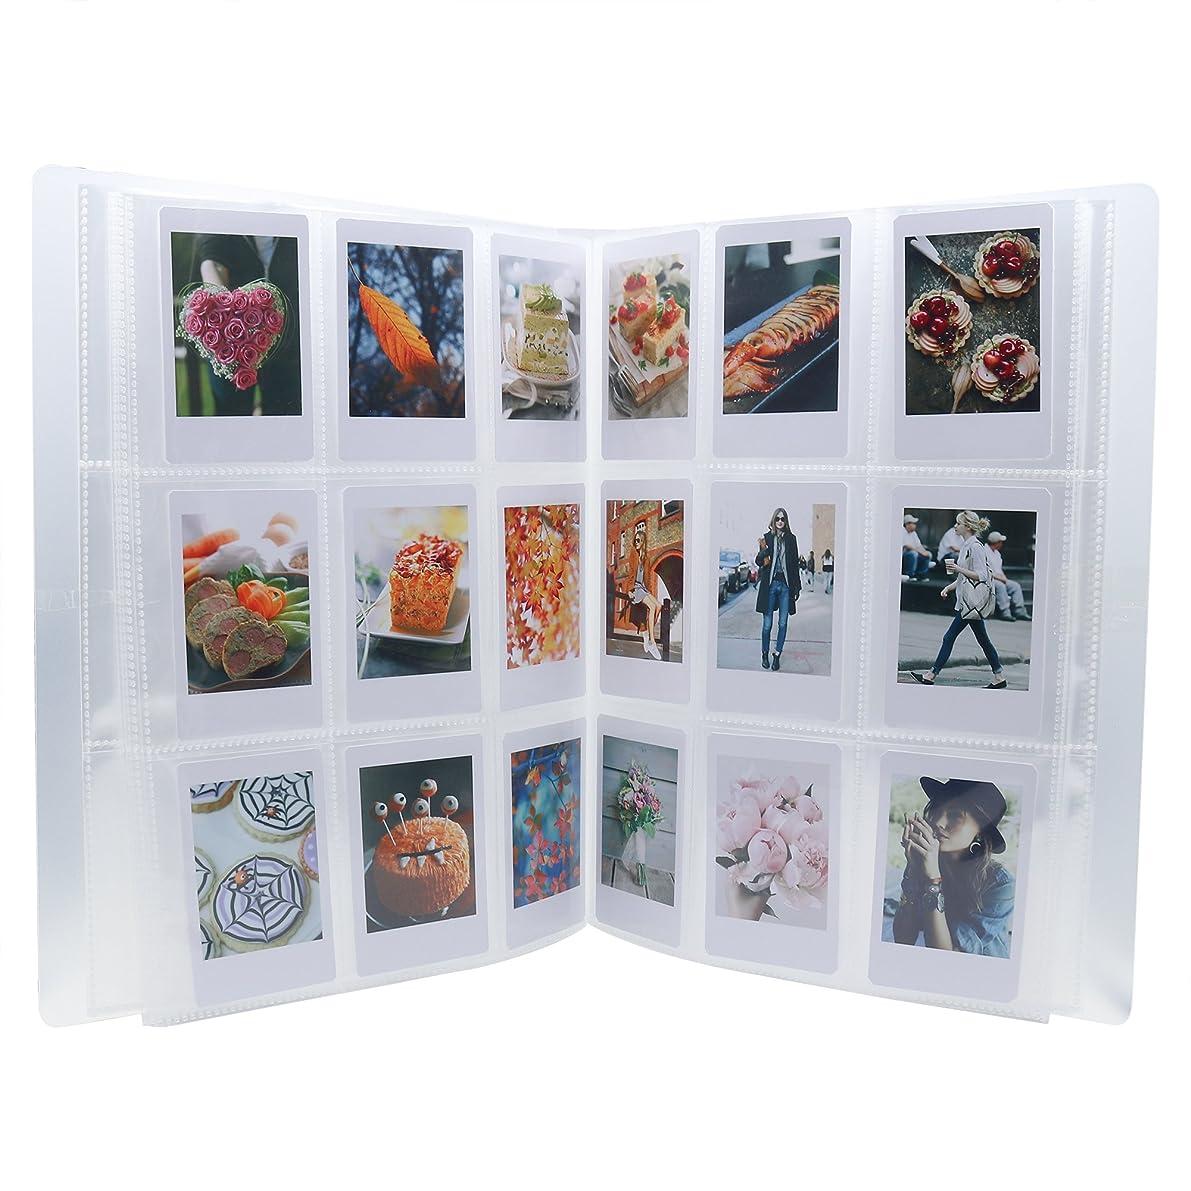 Ablus 288 Pockets Mini Photo Album for Fujifilm Instax Mini 7s 8 8+ 9 25 26 50s 70 90 Film, Name Card & 3 Inch Pictures